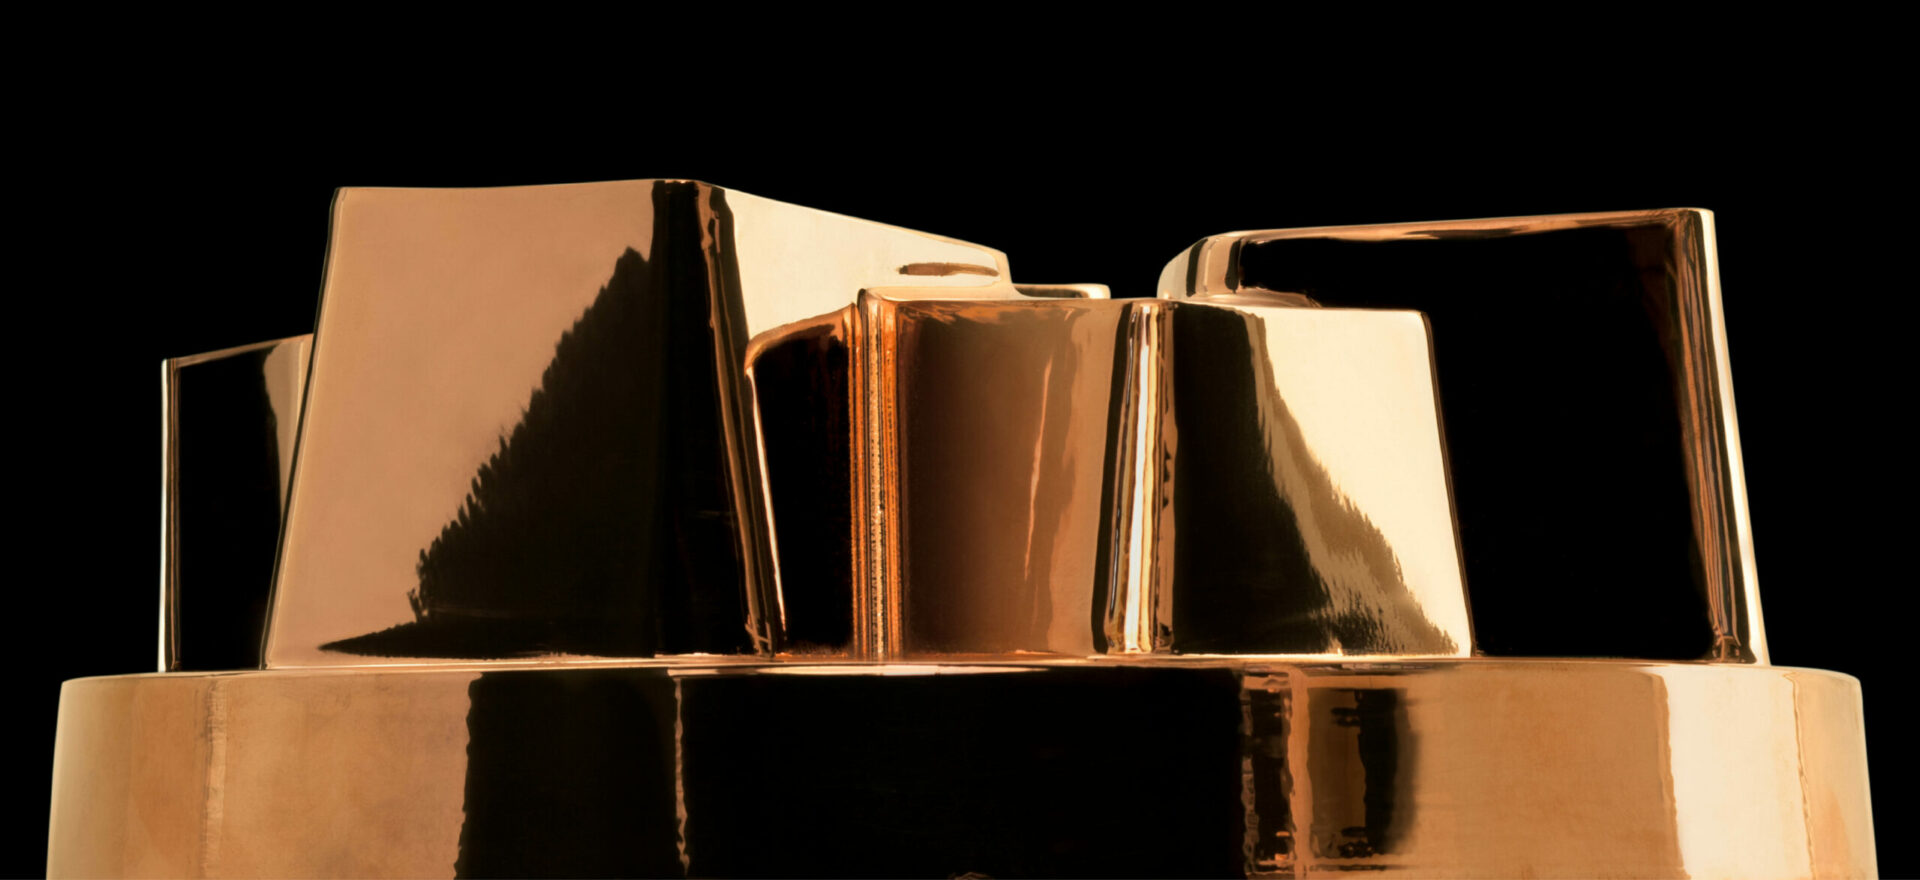 Dessert molds in copper | Numbered Edition | Kughelof & Savarin | Officina Alessi | Mario Trimarchi Design | Ph Santi Caleca